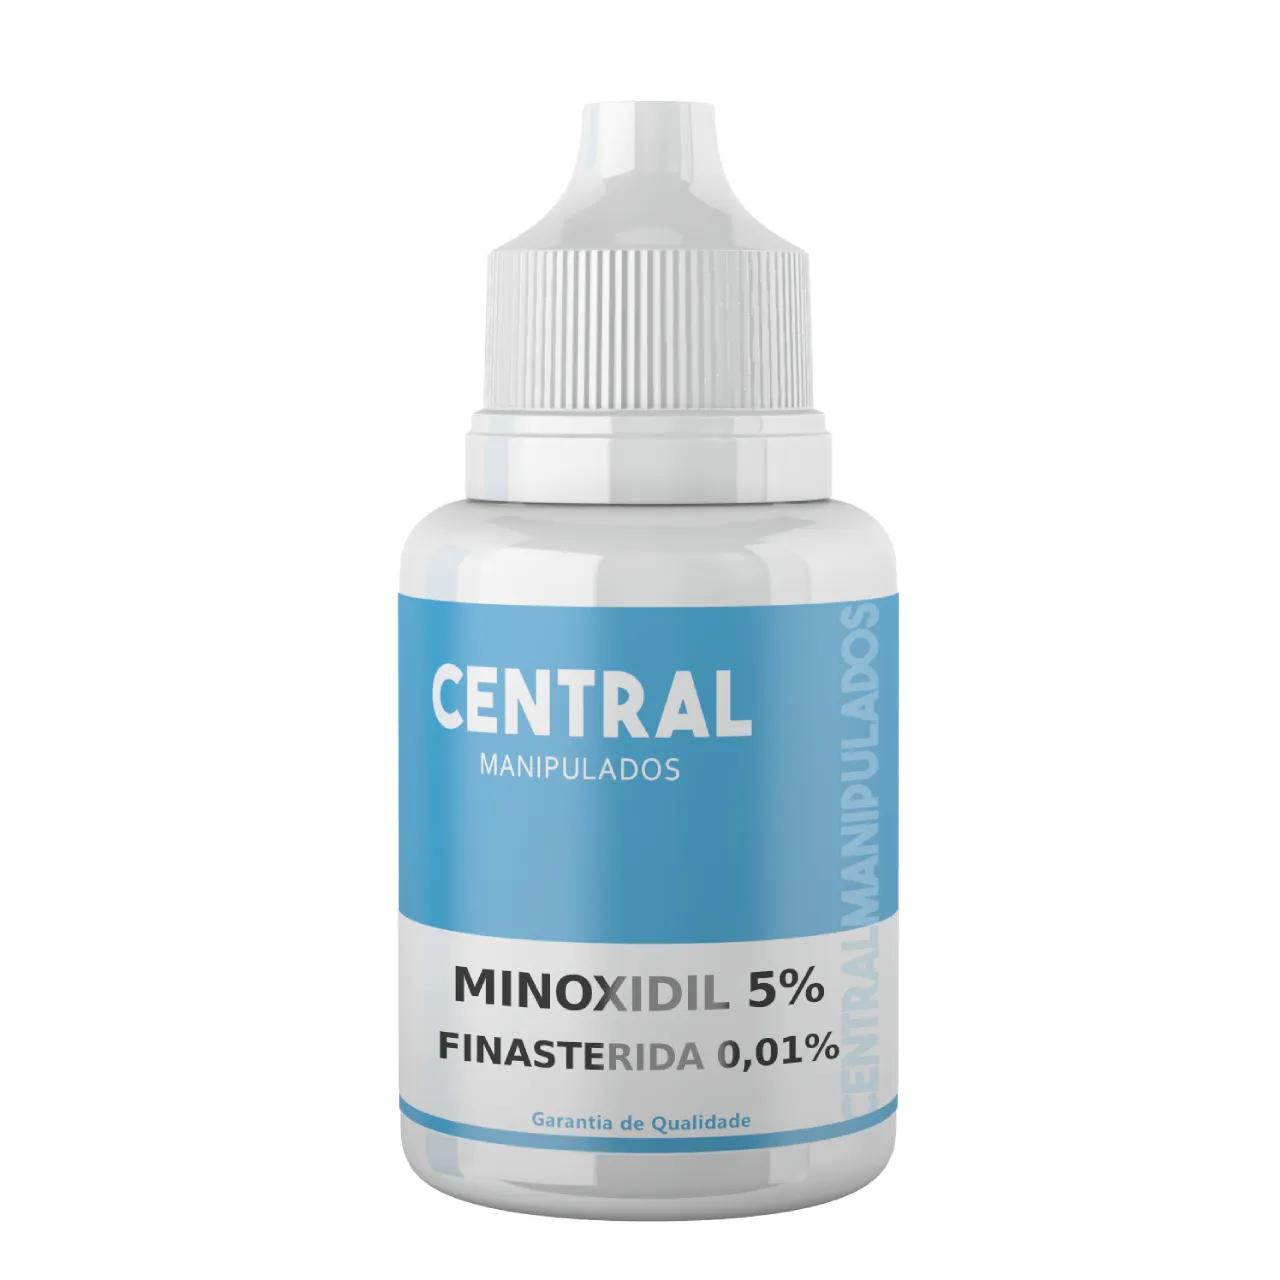 Minoxidil 5% + Finasterida 0,1%  TrichoSol  - Solução - 200ml - Tecnologia TrichoConcept da Fragon